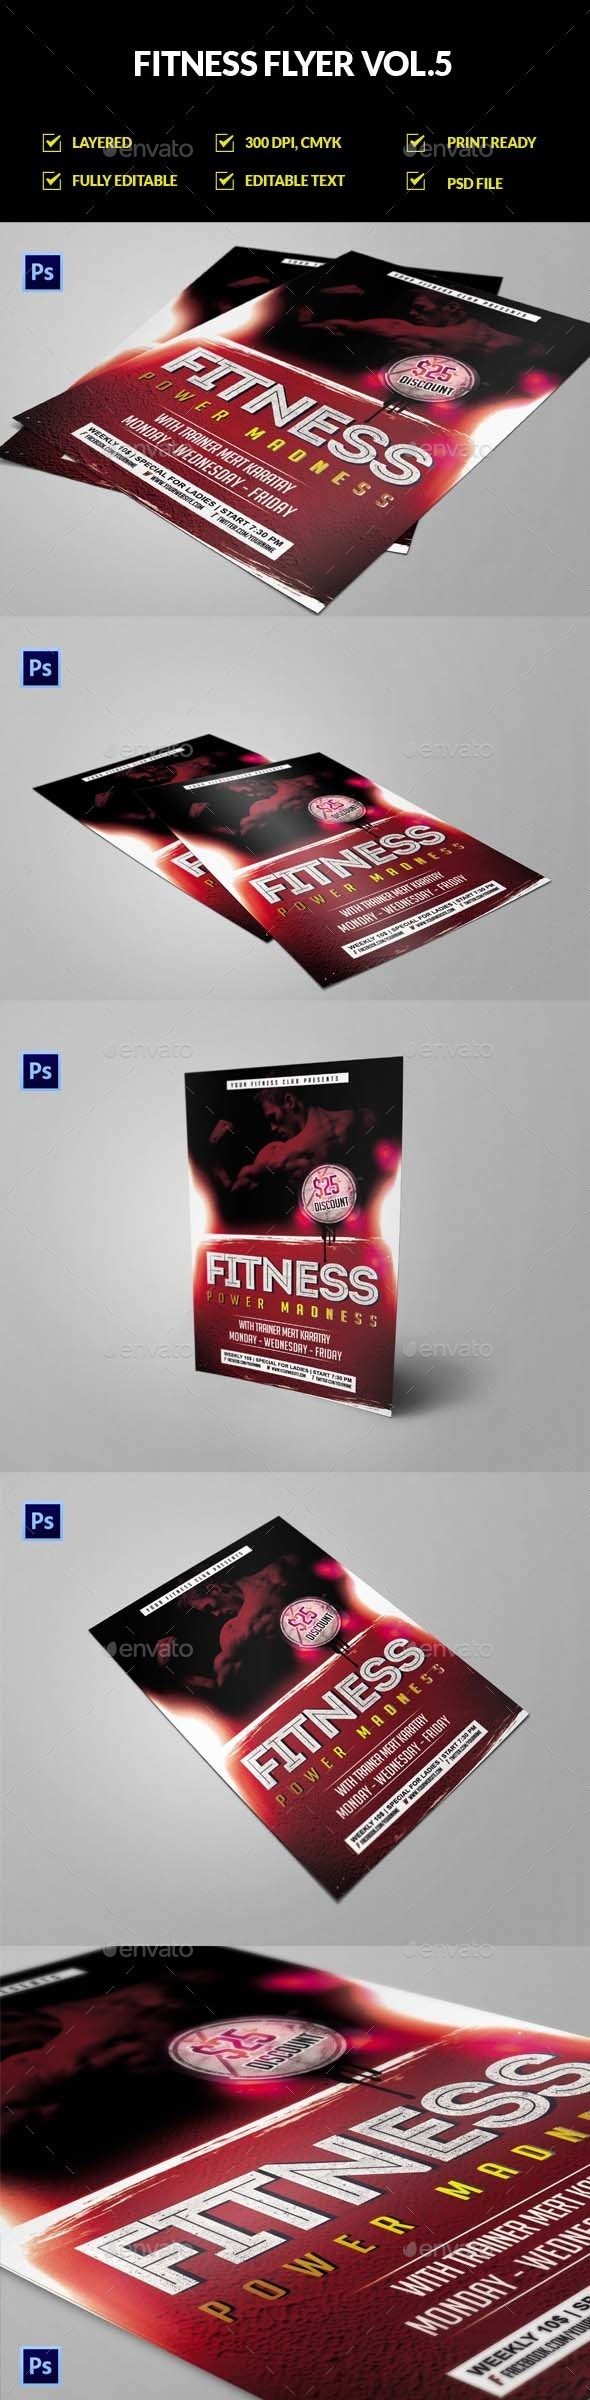 Fitness Flyer Vol.5